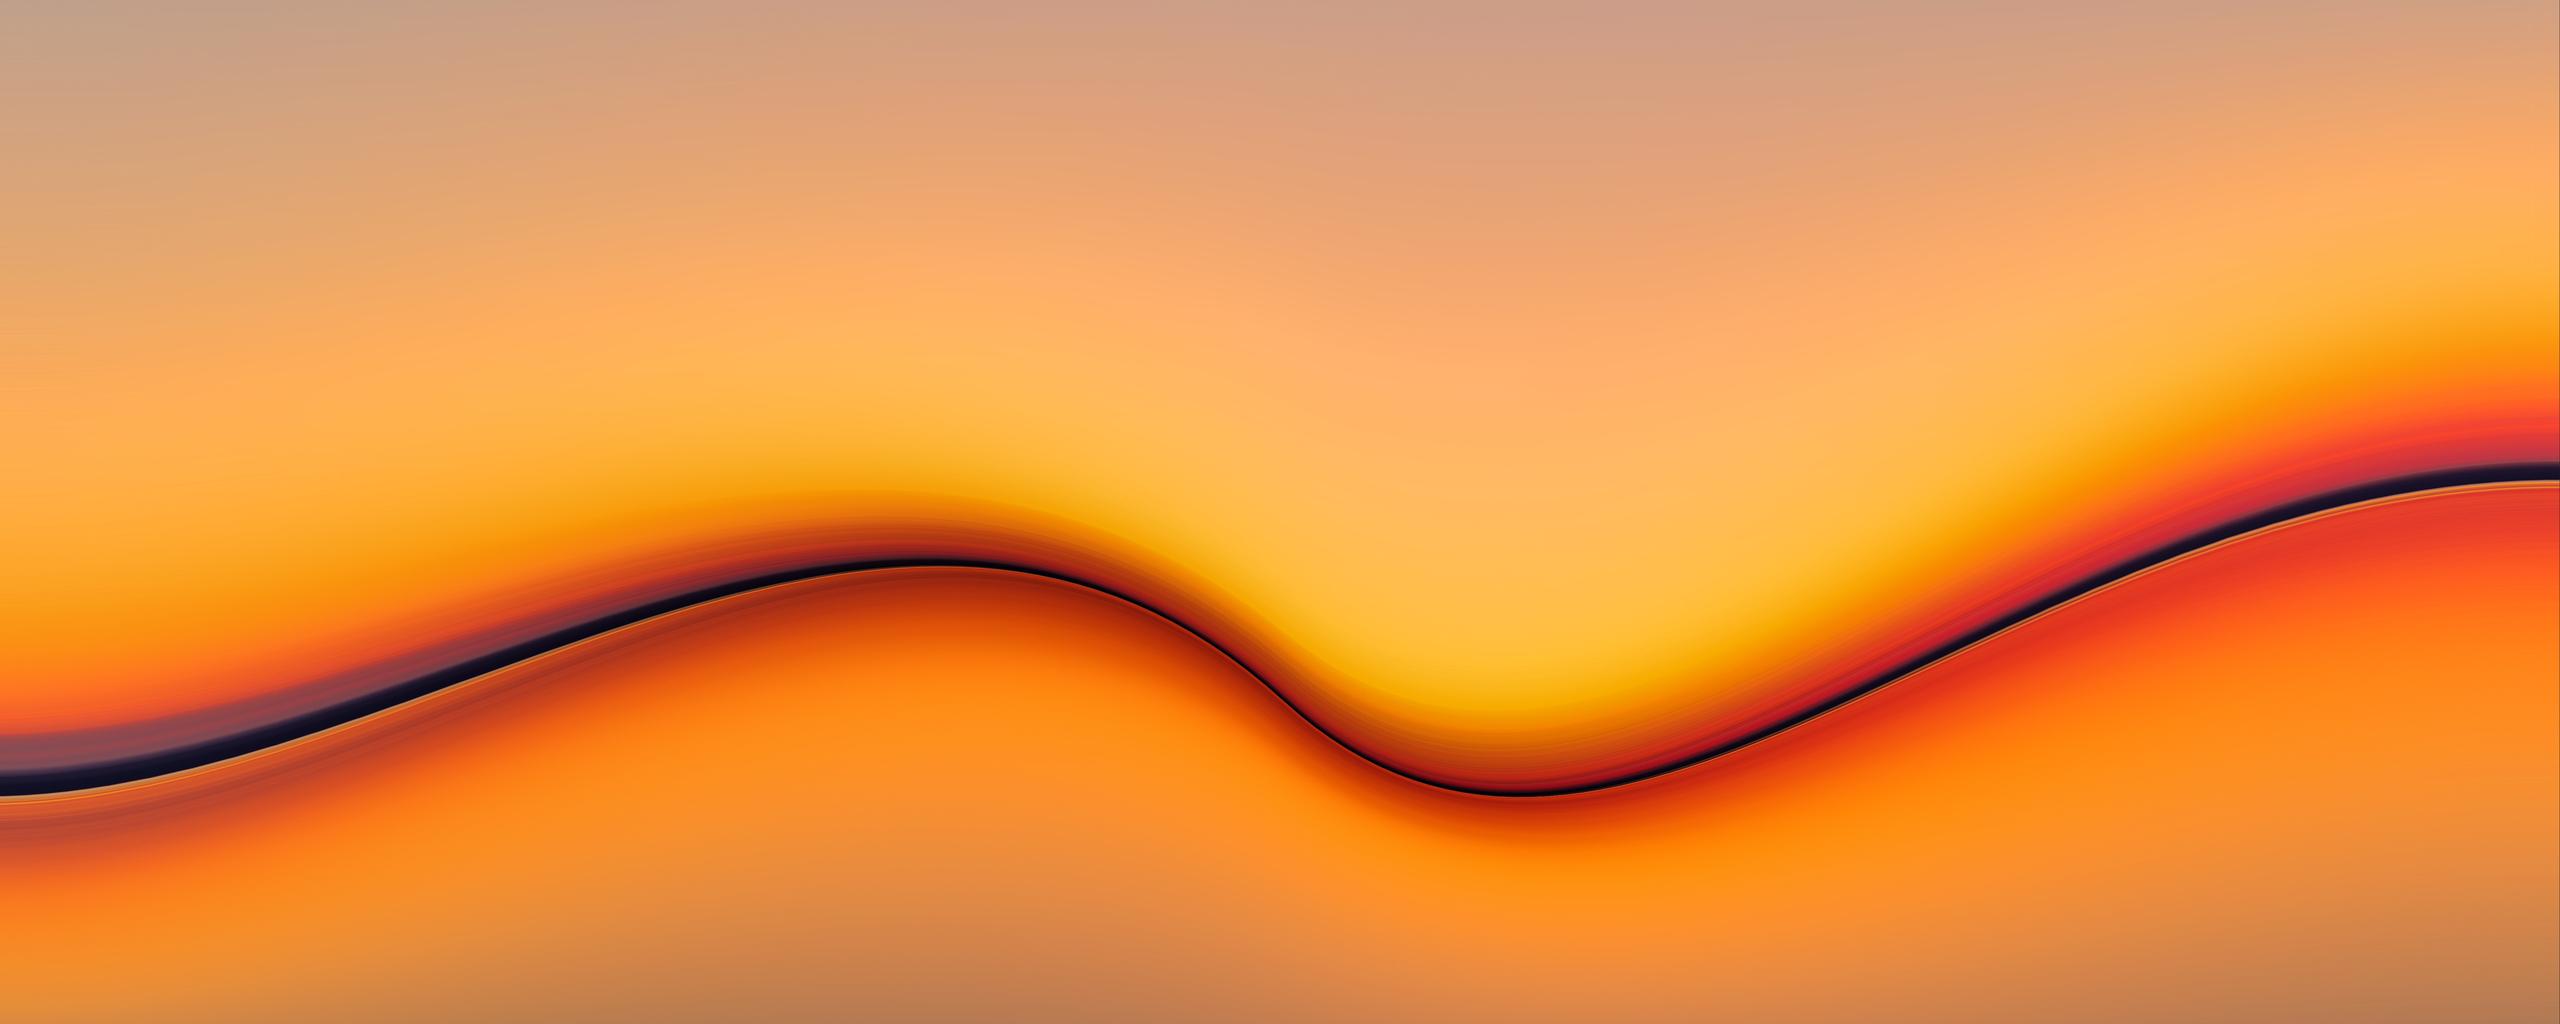 solid-break-abstract-8k-ju.jpg